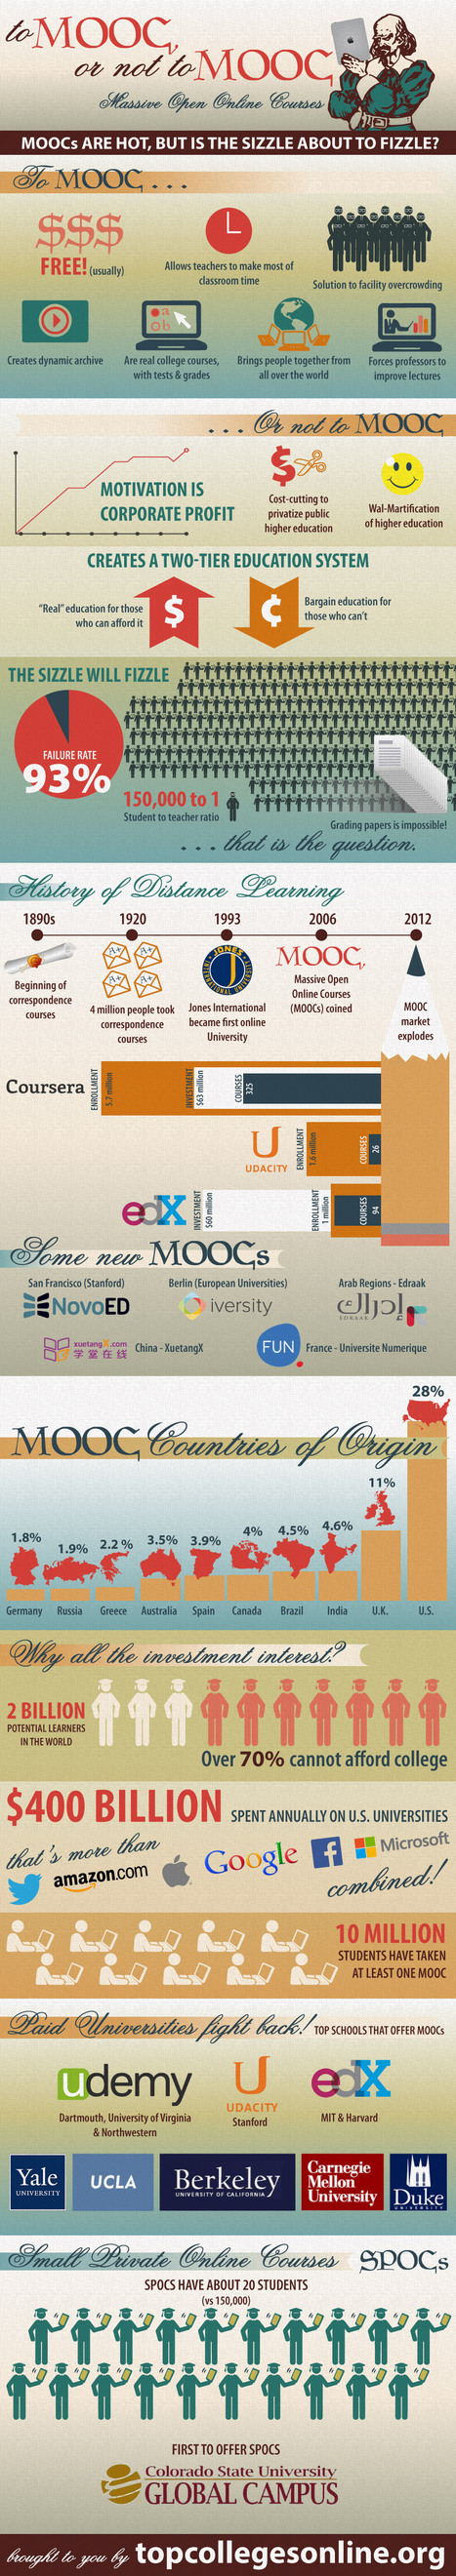 To MOOC, or not to MOOC - SiteProNews | Pilar Moreno: MOOCs (Massive Online Open Courses) | Scoop.it